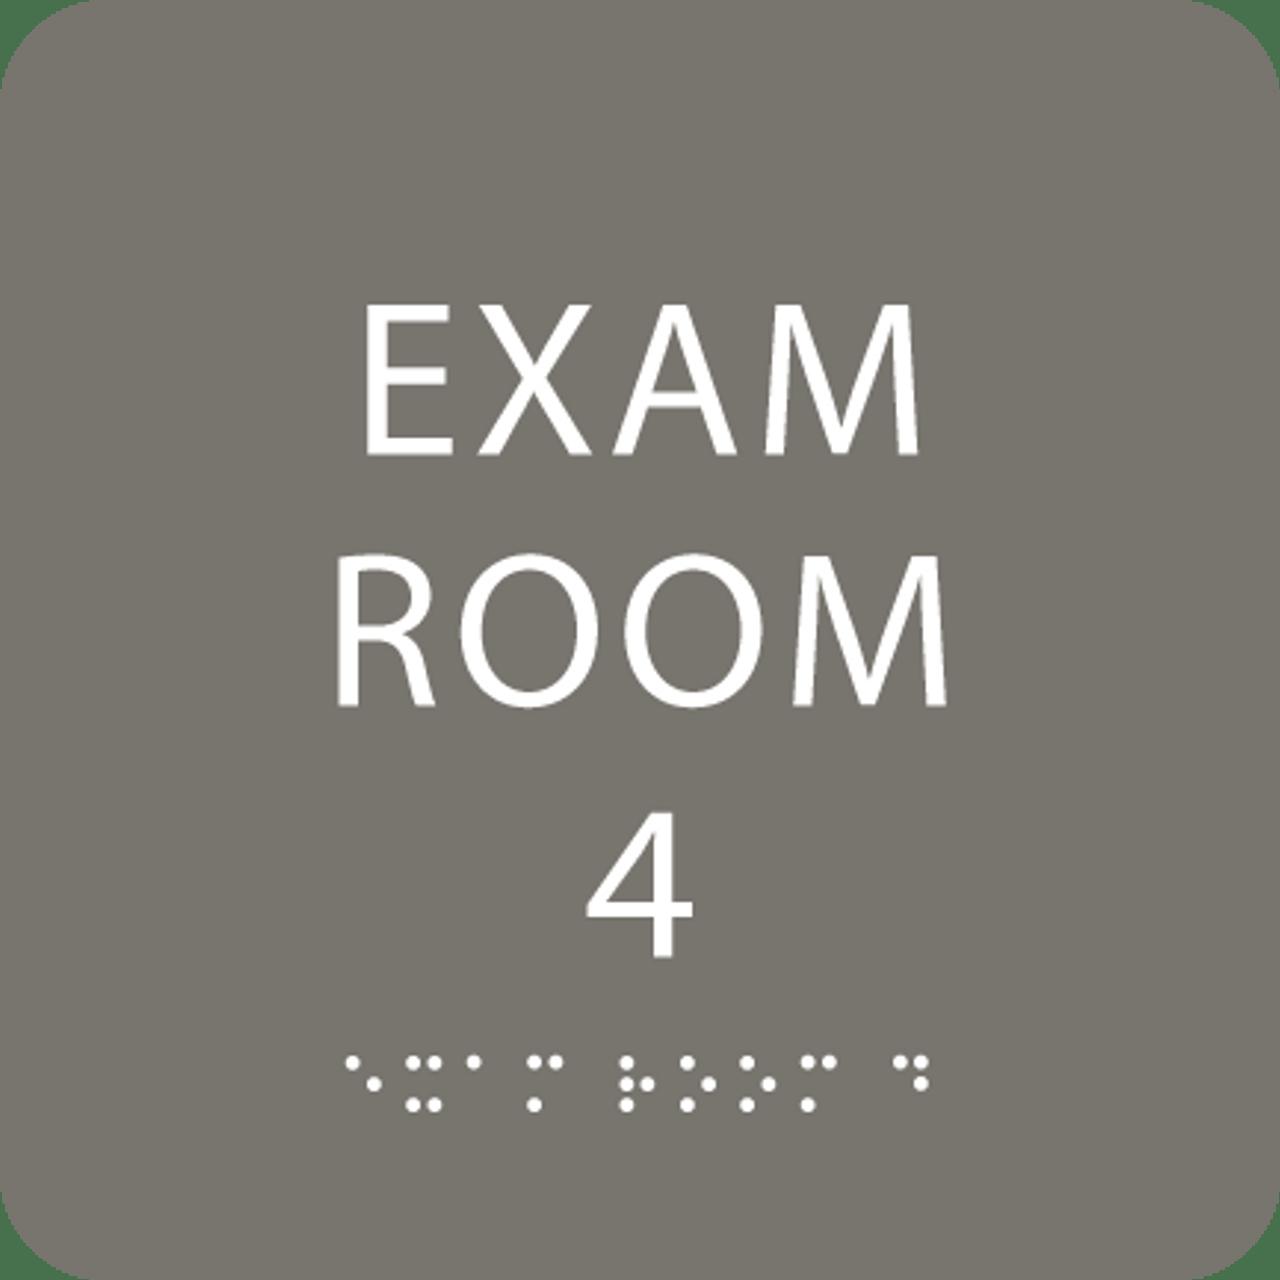 Dark Grey Exam Room 4 ADA Sign